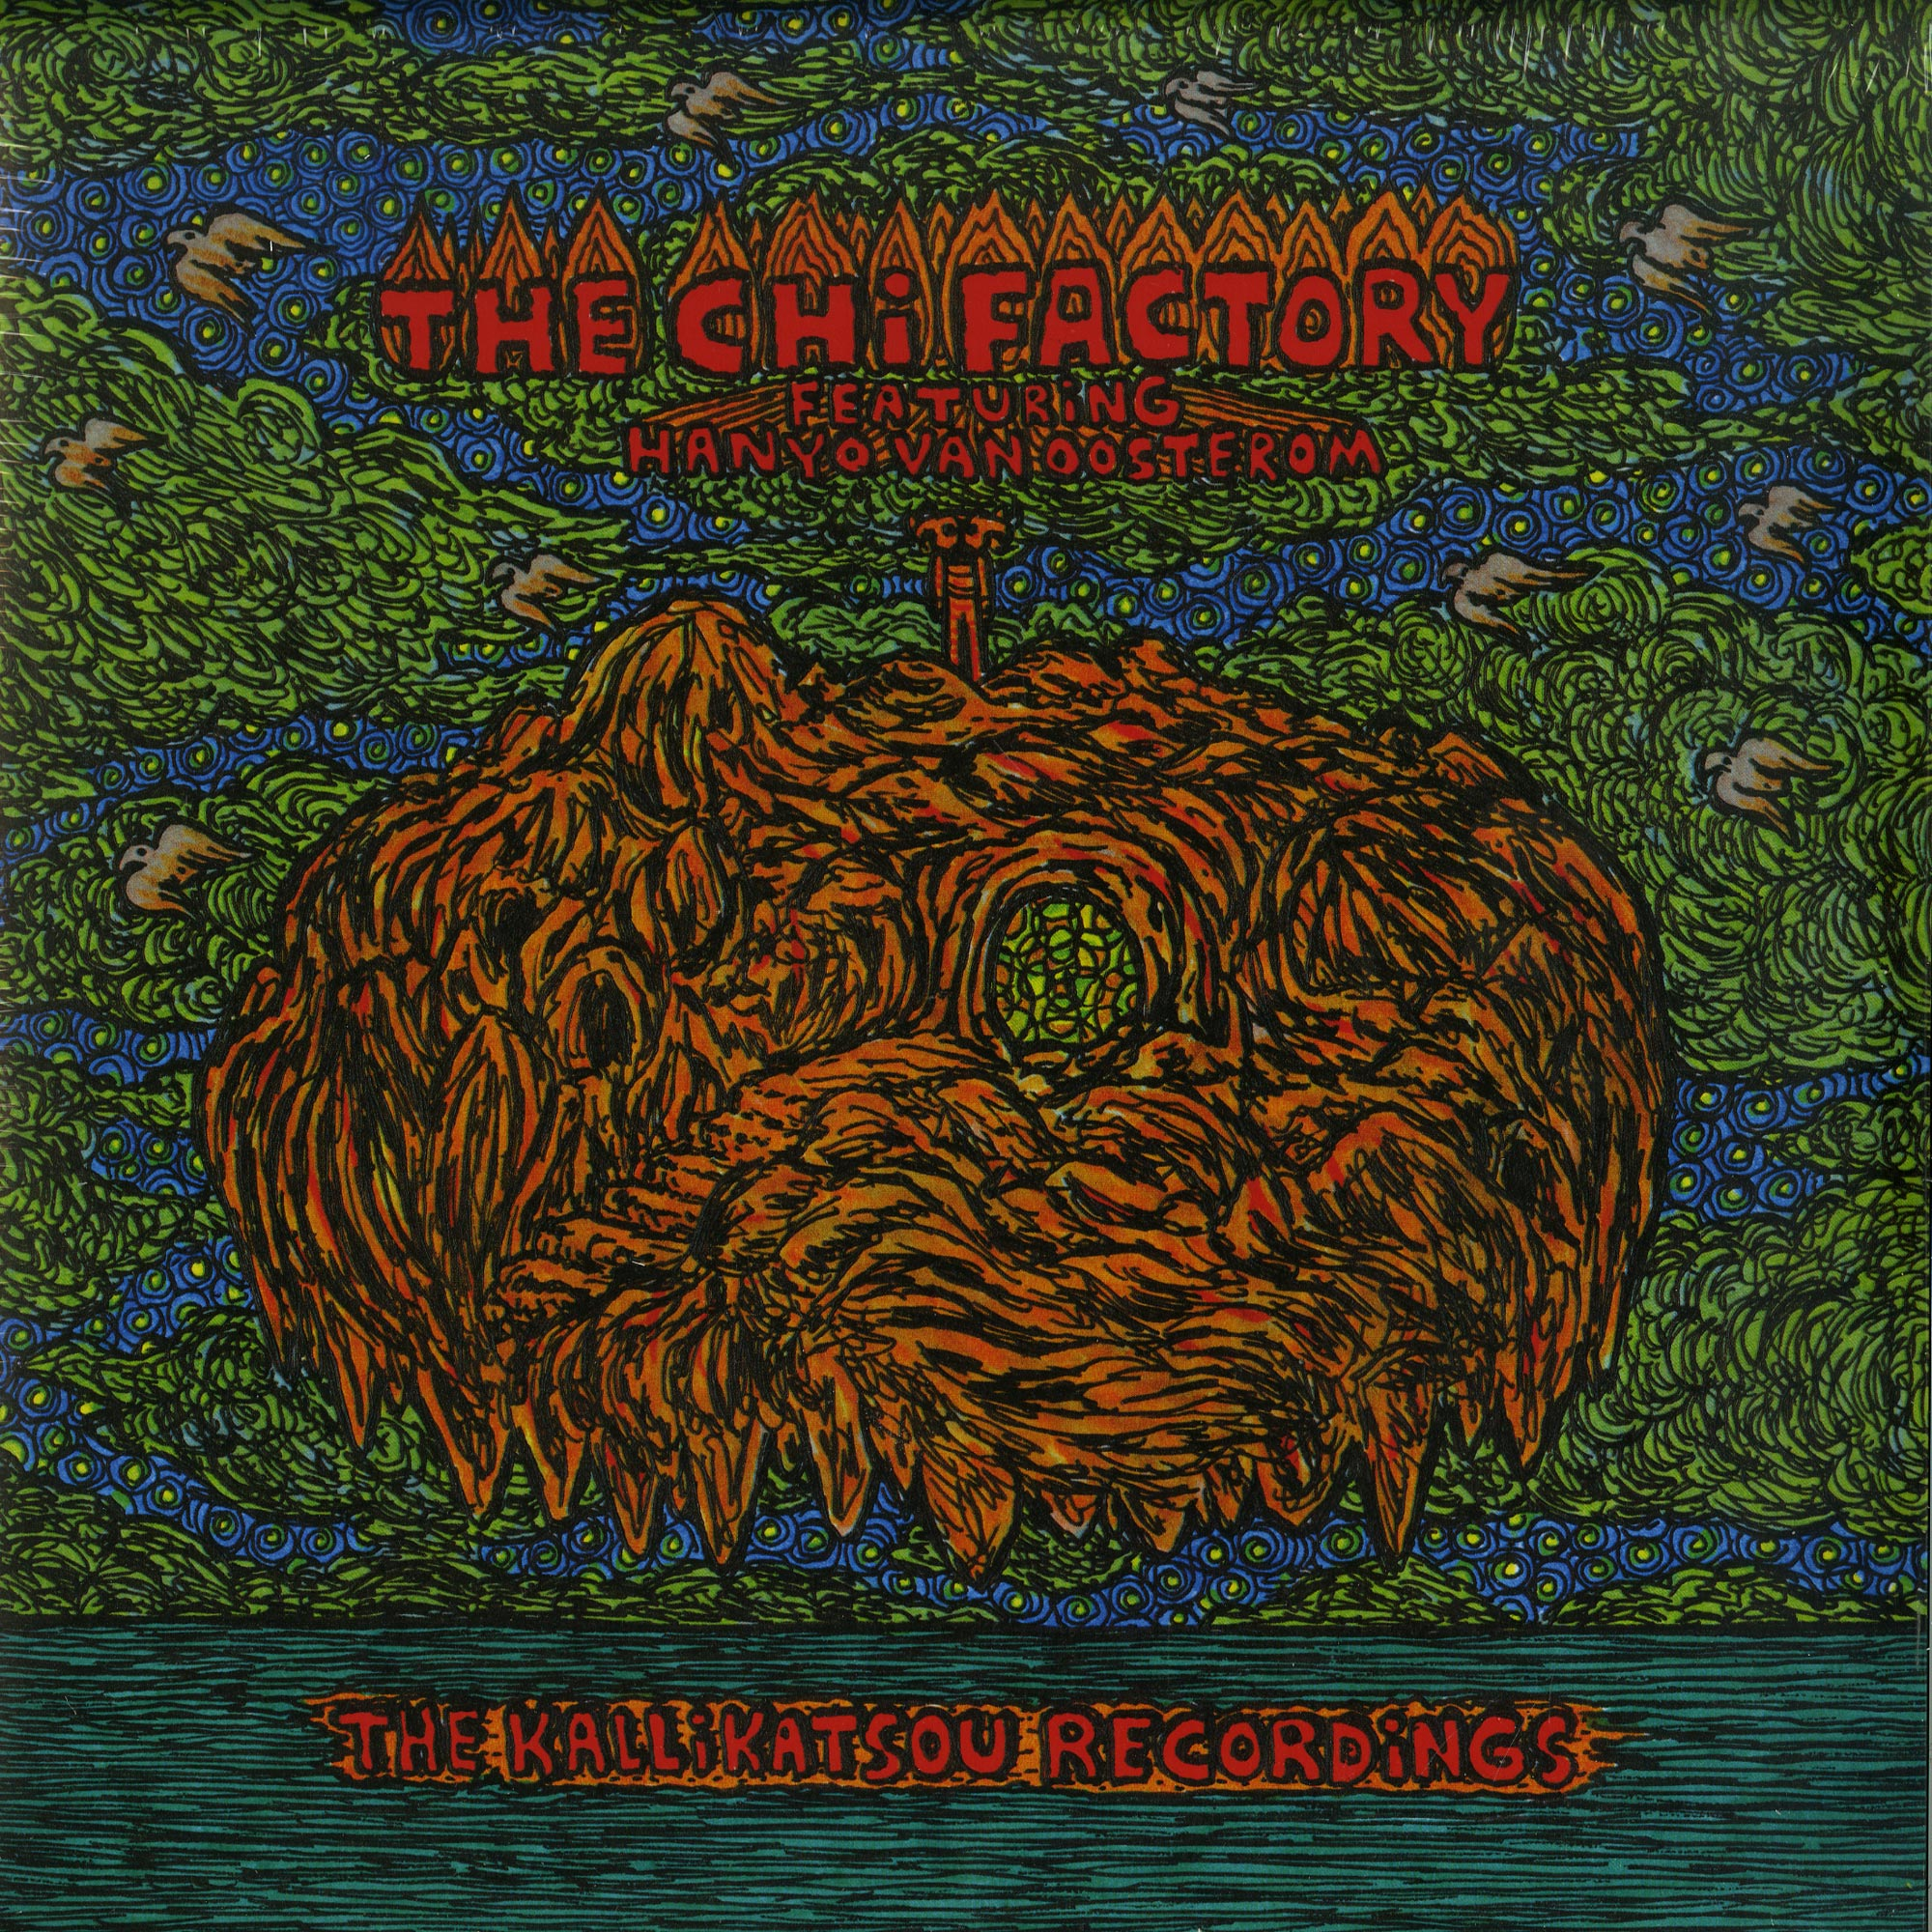 The Chi Factory - THE KALLIKATSOU RECORDINGS